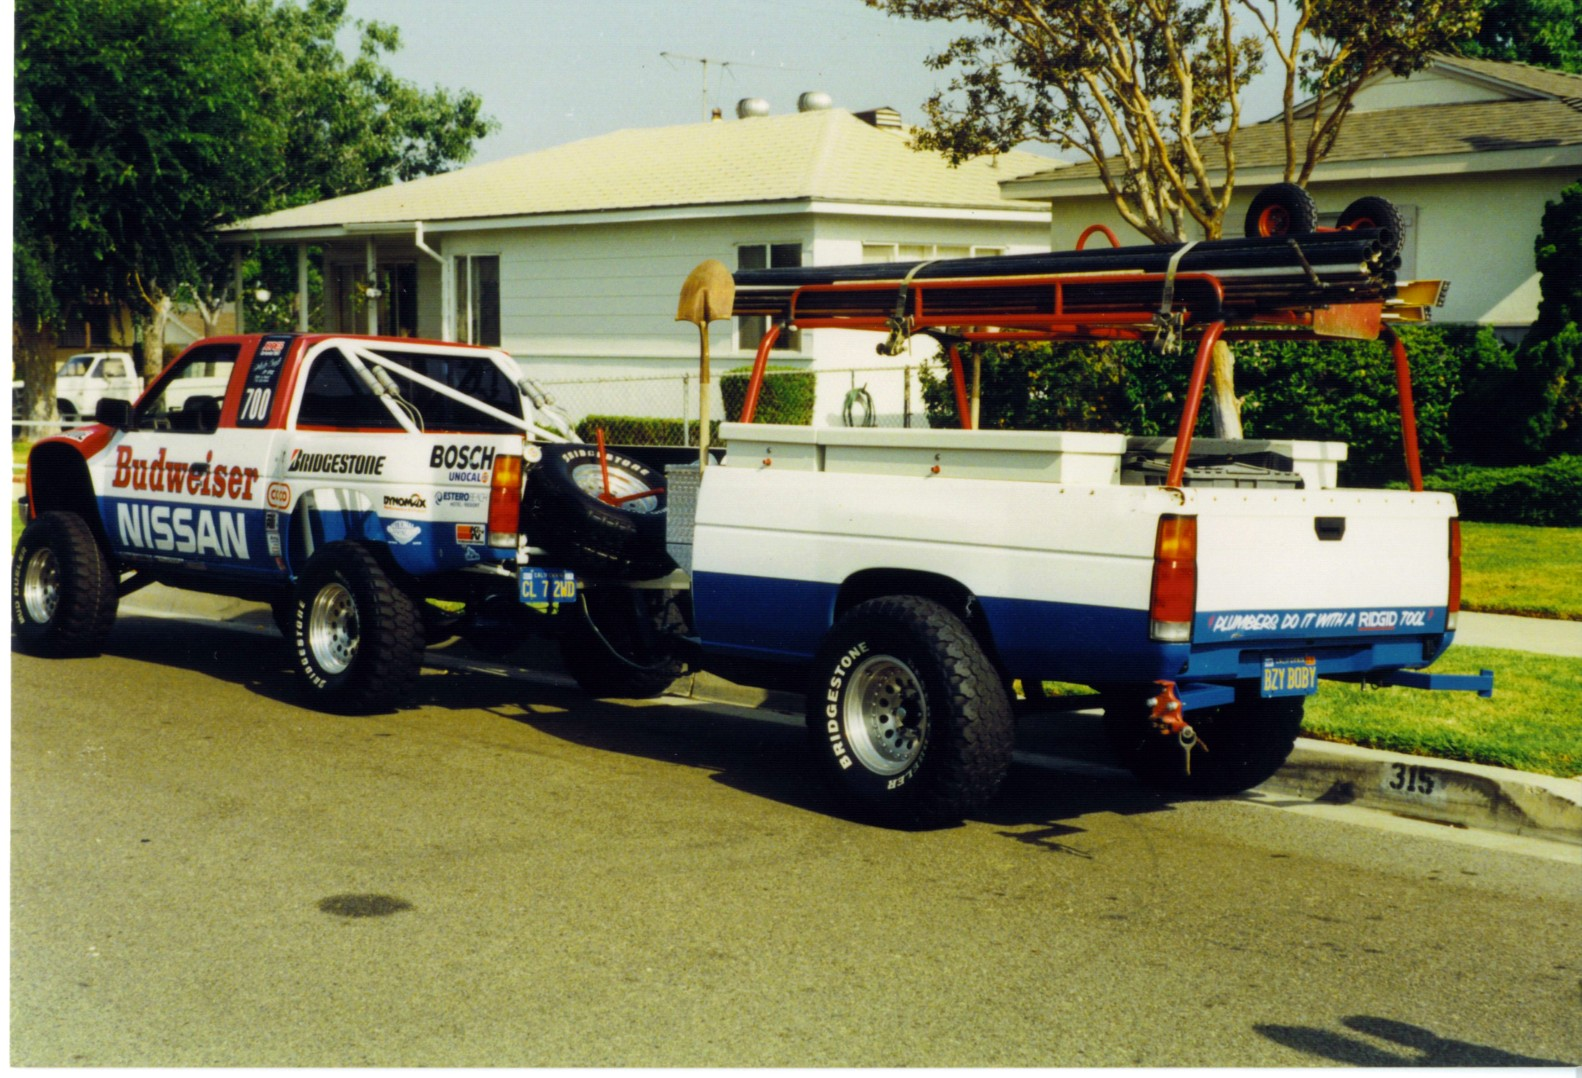 95 Nissan Hardbody Pickup Engine Compatibility Titan Forum Old Trucks For Sale Work Truck Edit